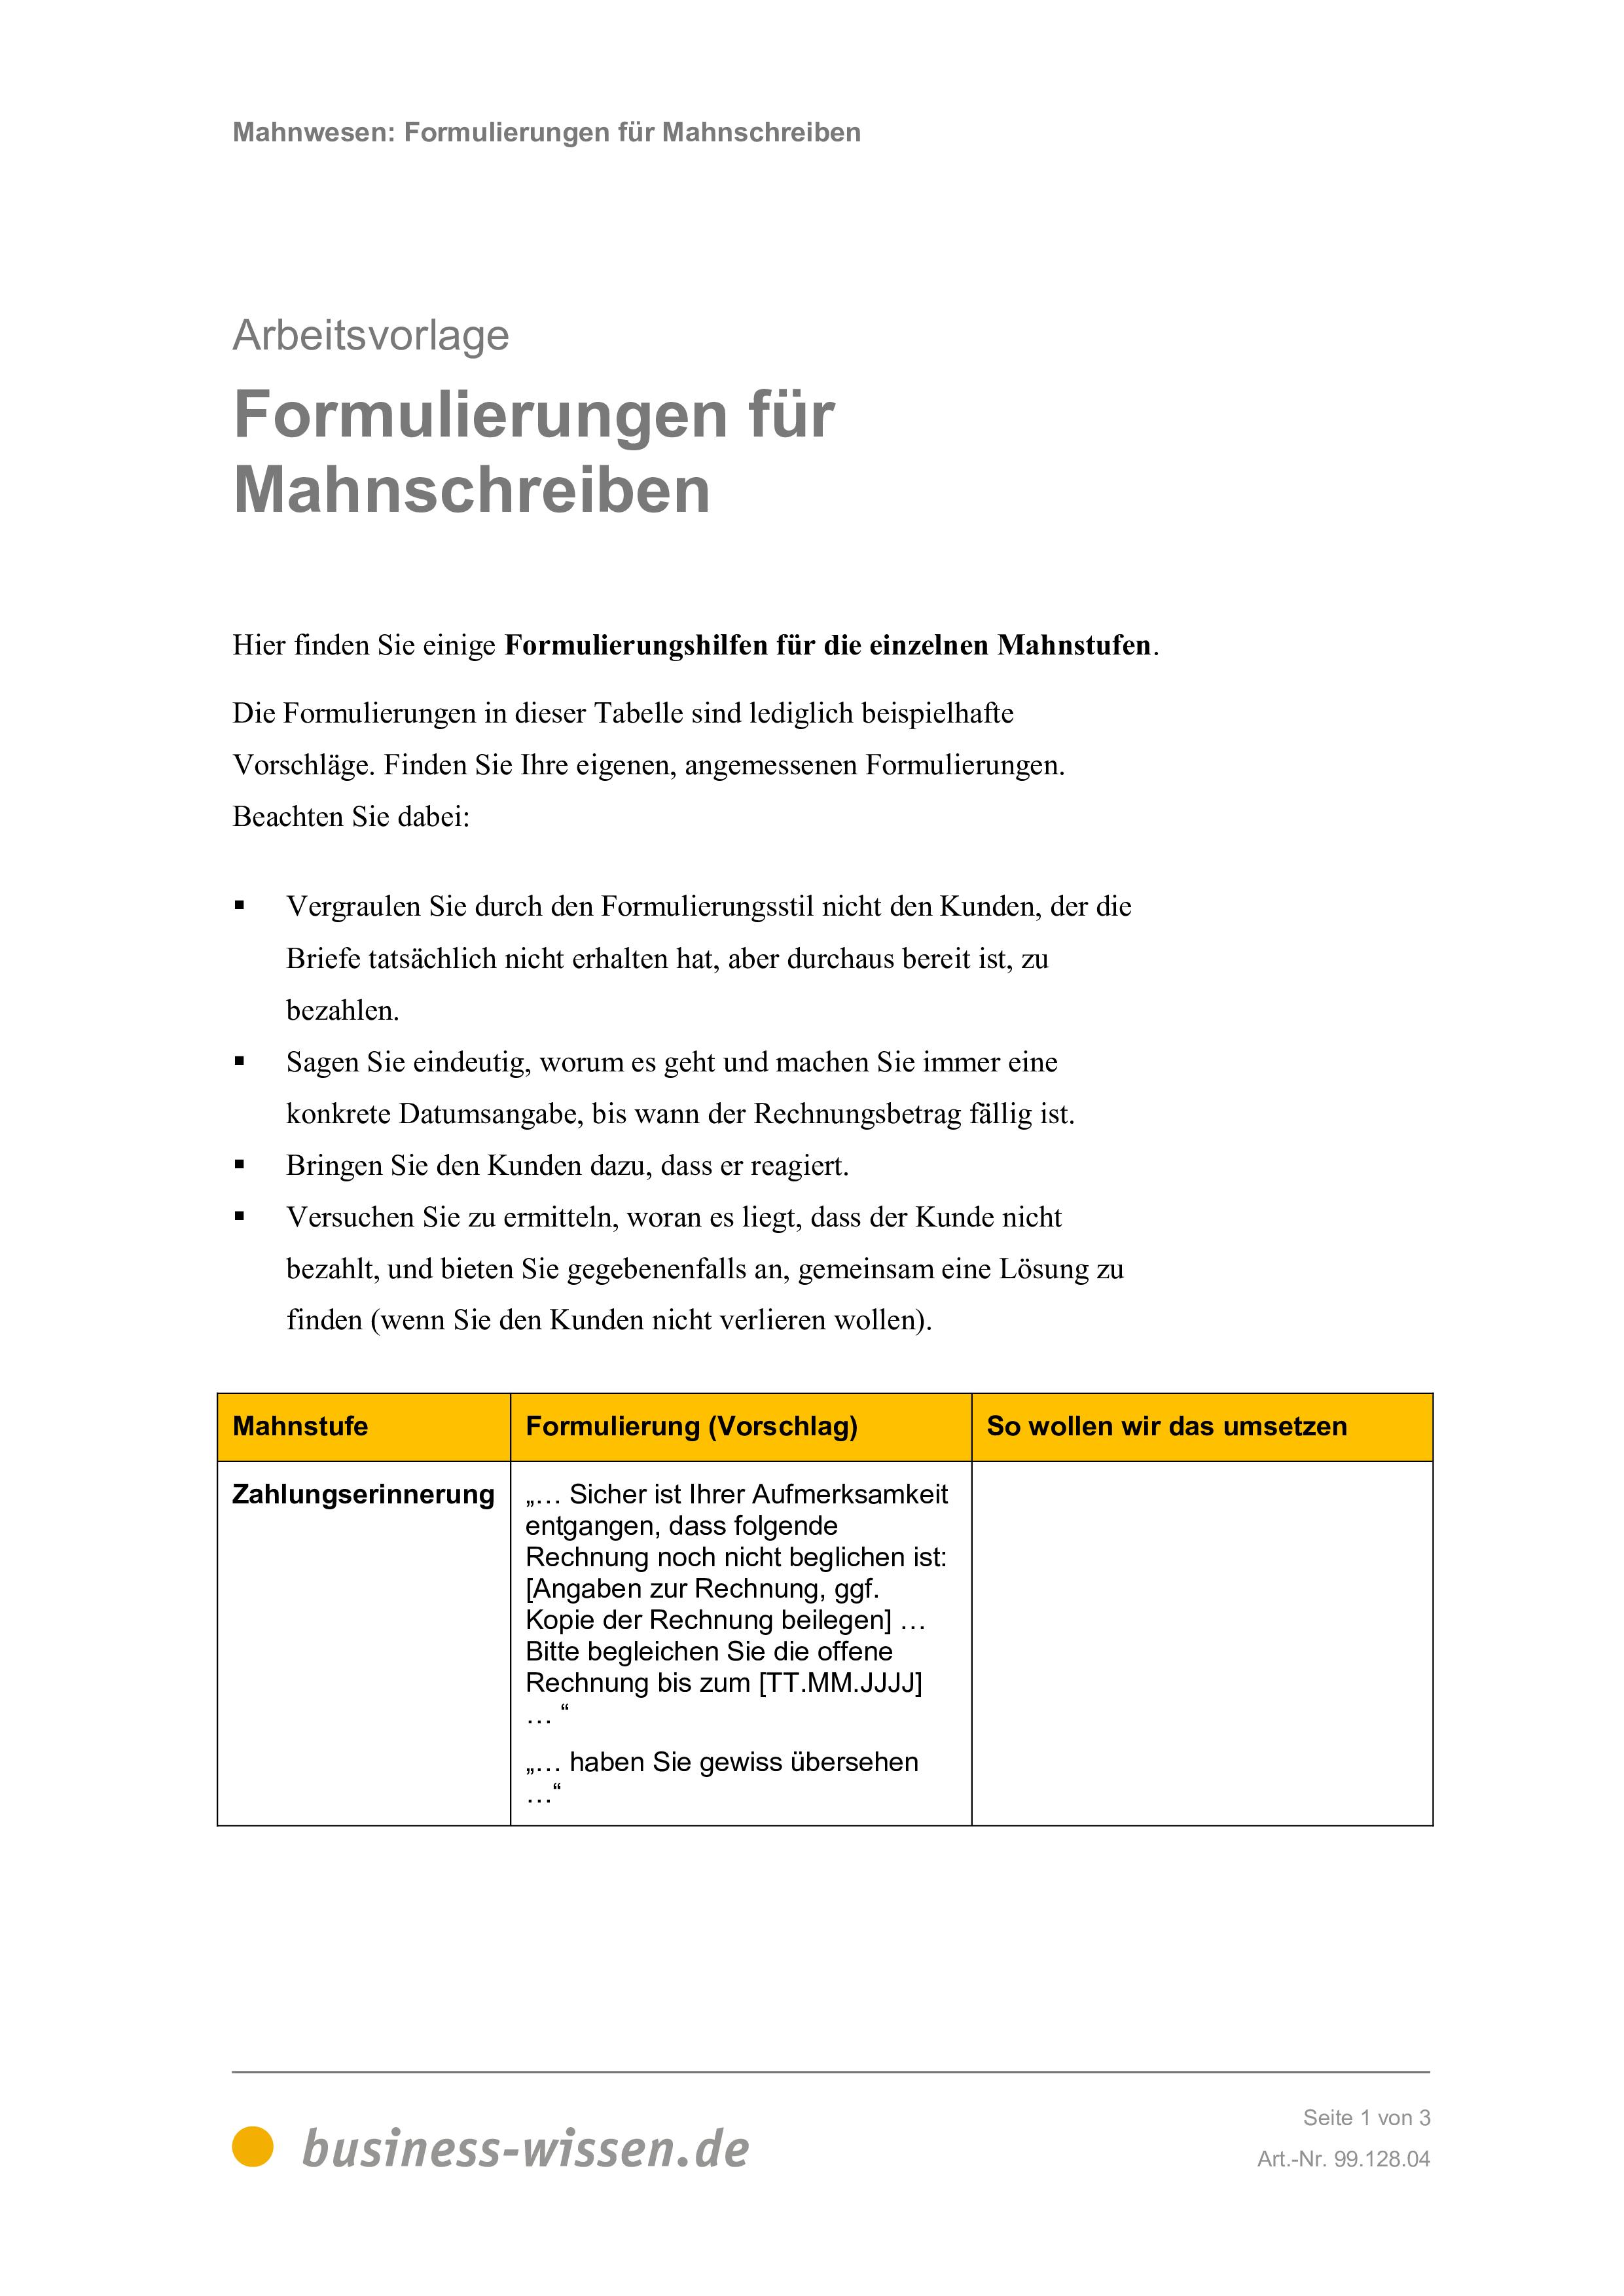 mahnwesen management handbuch business. Black Bedroom Furniture Sets. Home Design Ideas